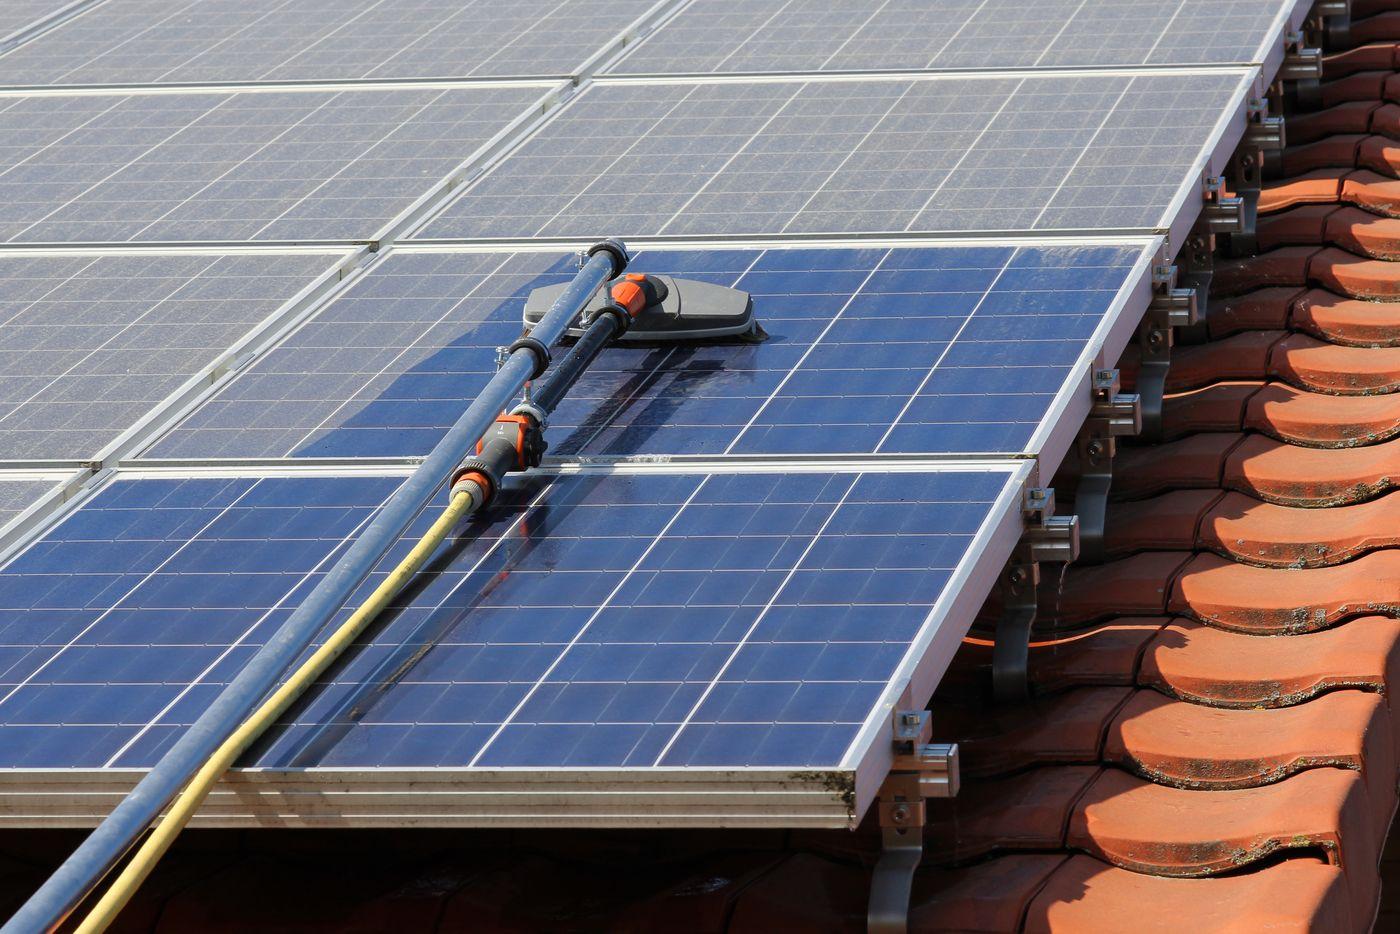 Solarpanel Reinigung